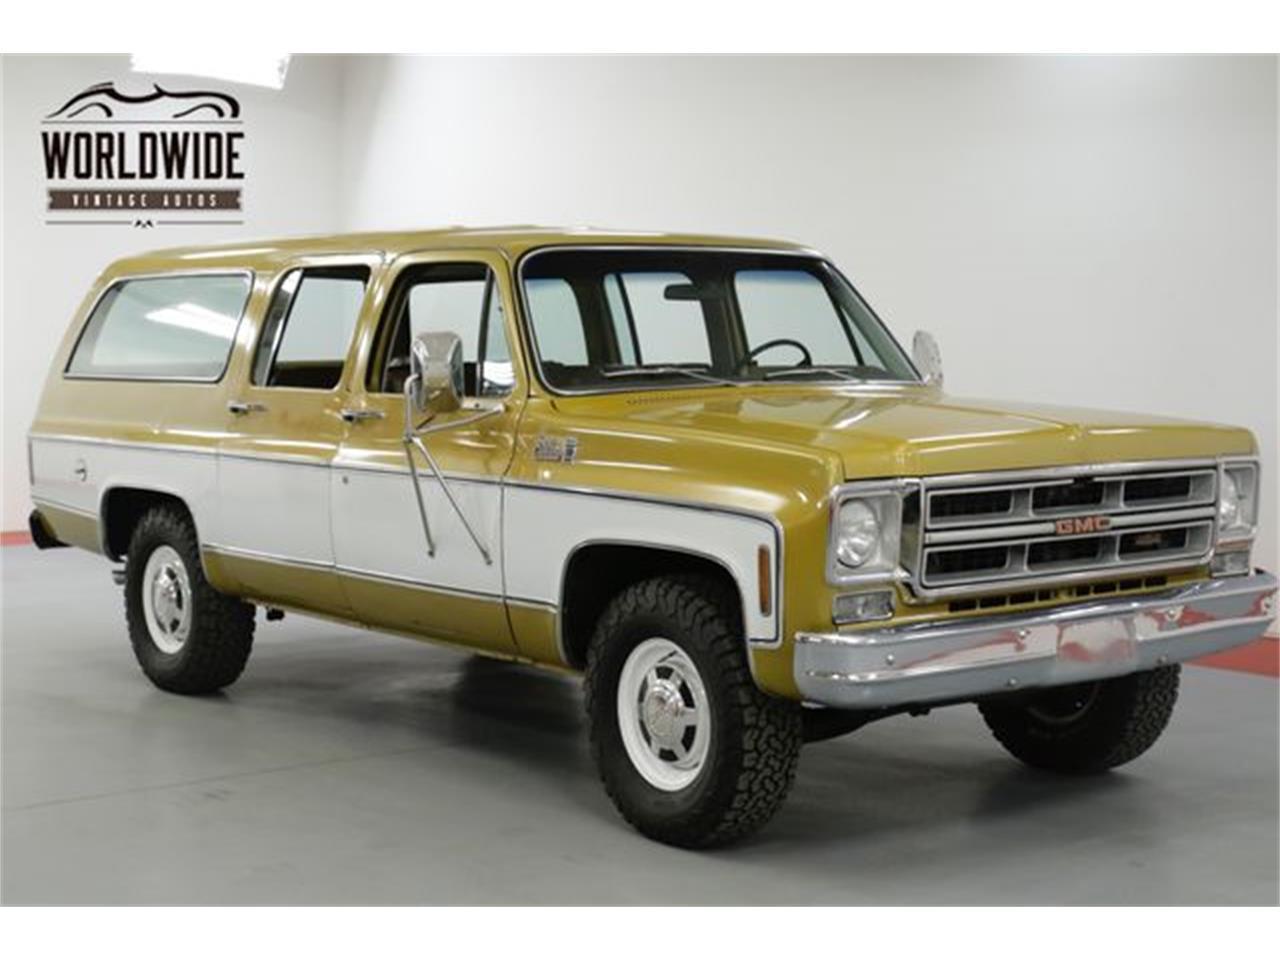 1976 Gmc Suburban For Sale In Denver Co Classiccarsbay Com